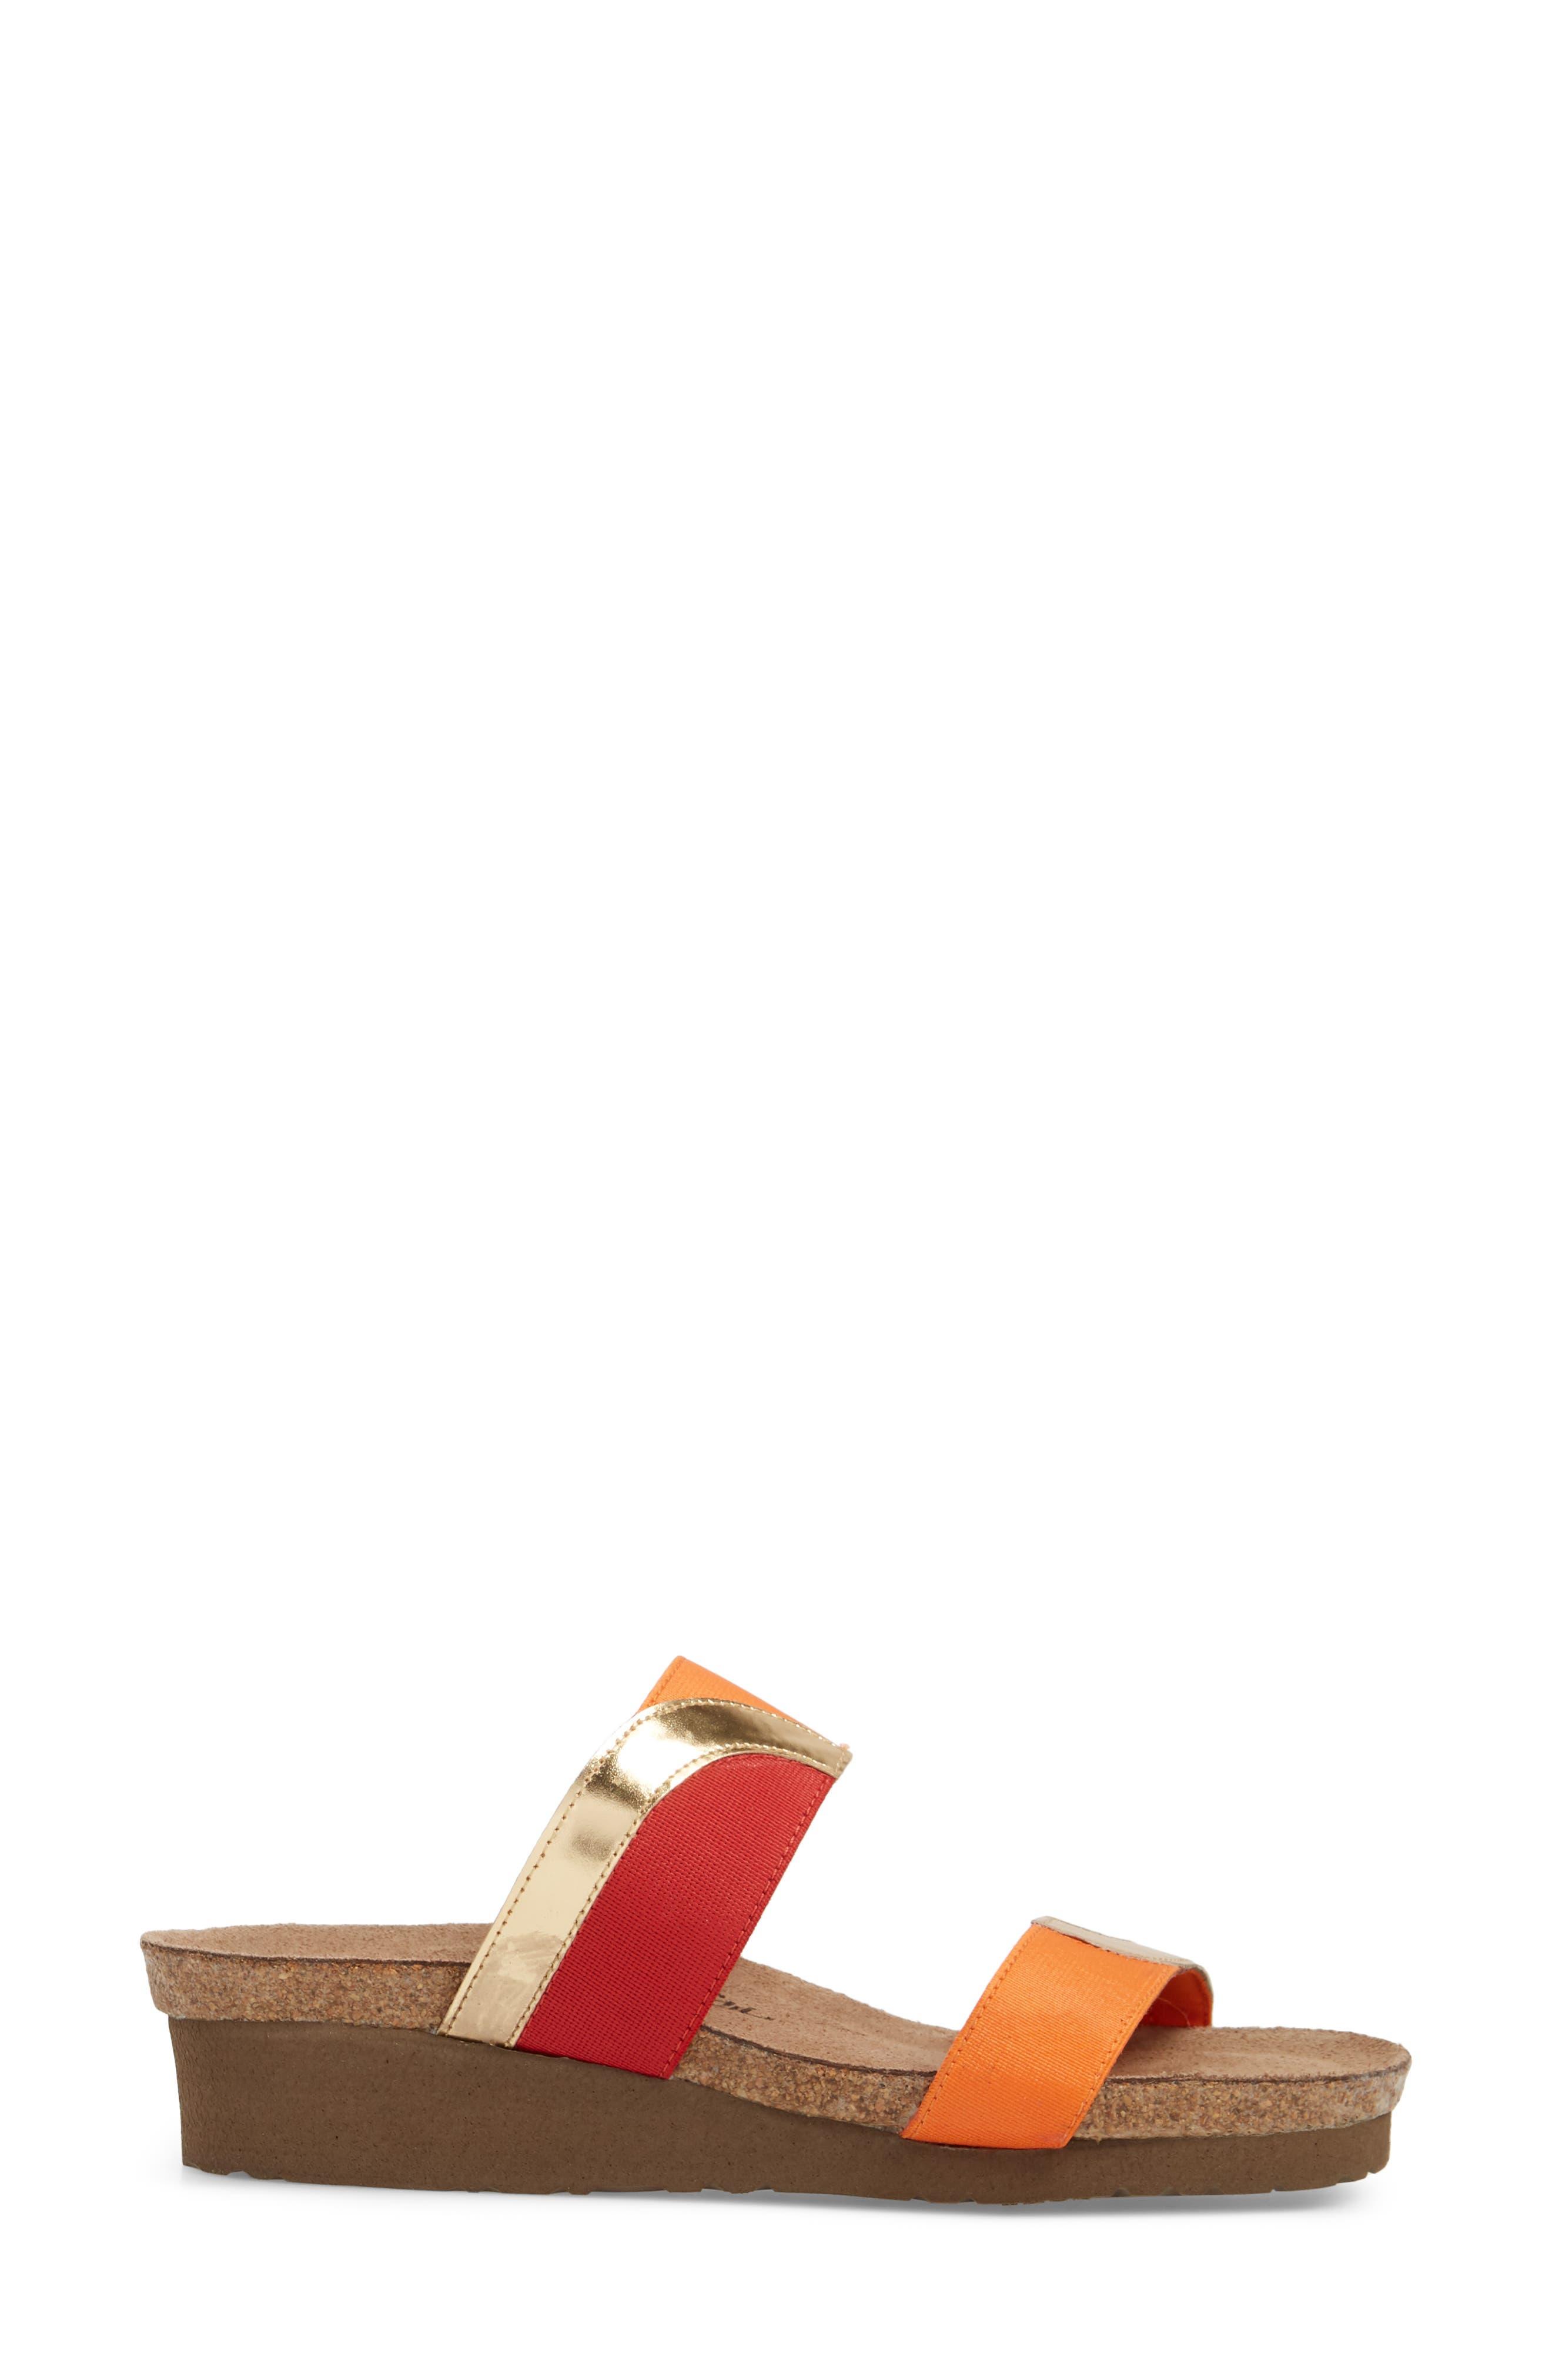 Frankie Slide Sandal,                             Alternate thumbnail 3, color,                             Red/ Orange/ Gold Leather